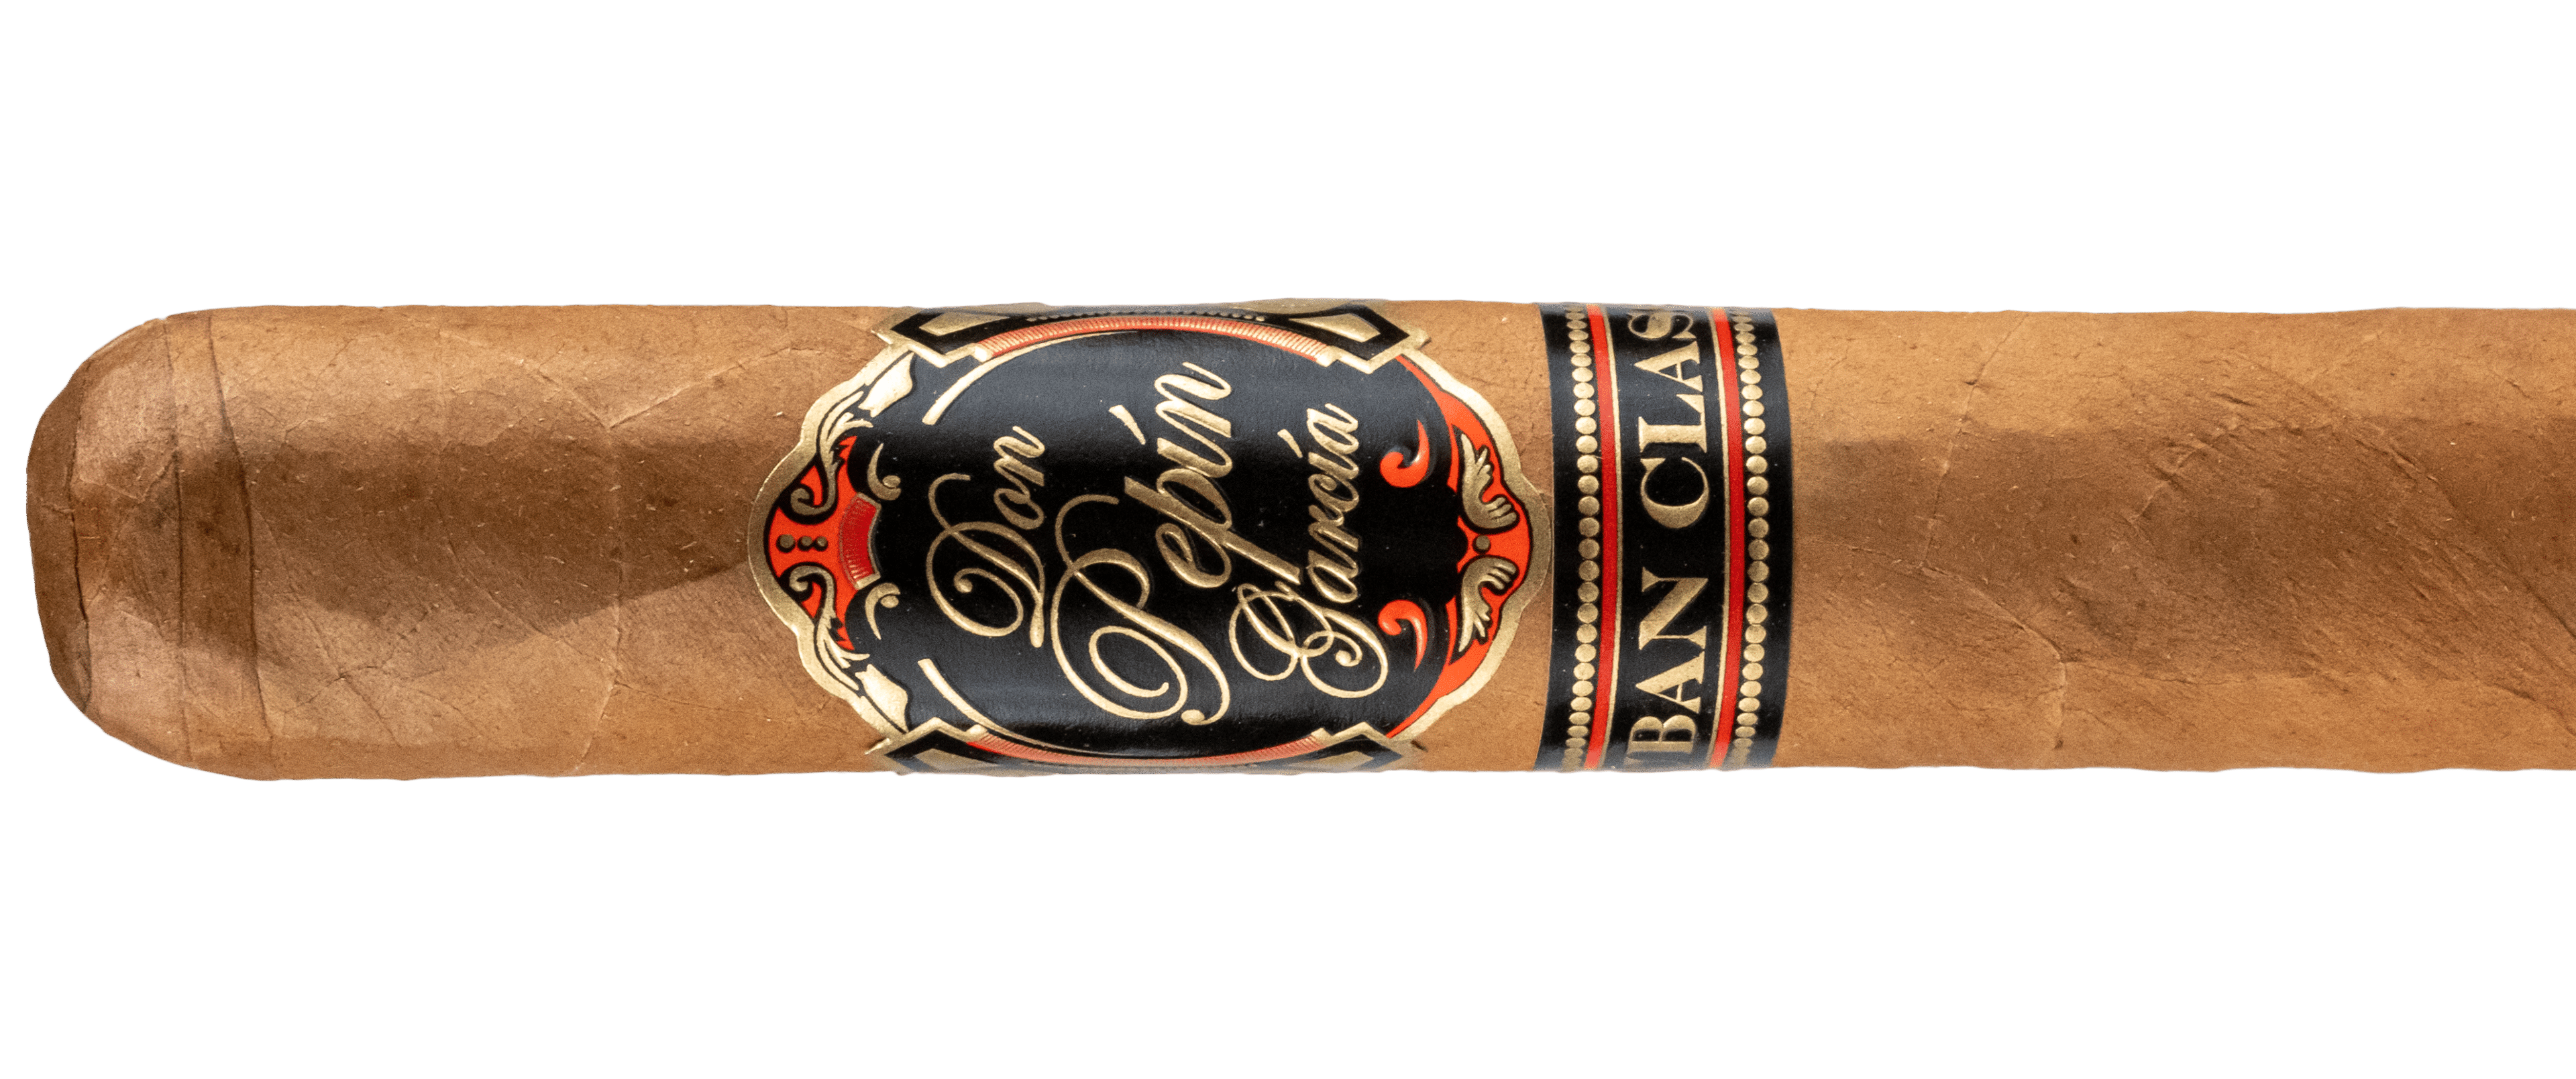 My Father Don Pepin Garcia Cuban Classic Connecticut Toro - Blind Cigar Review